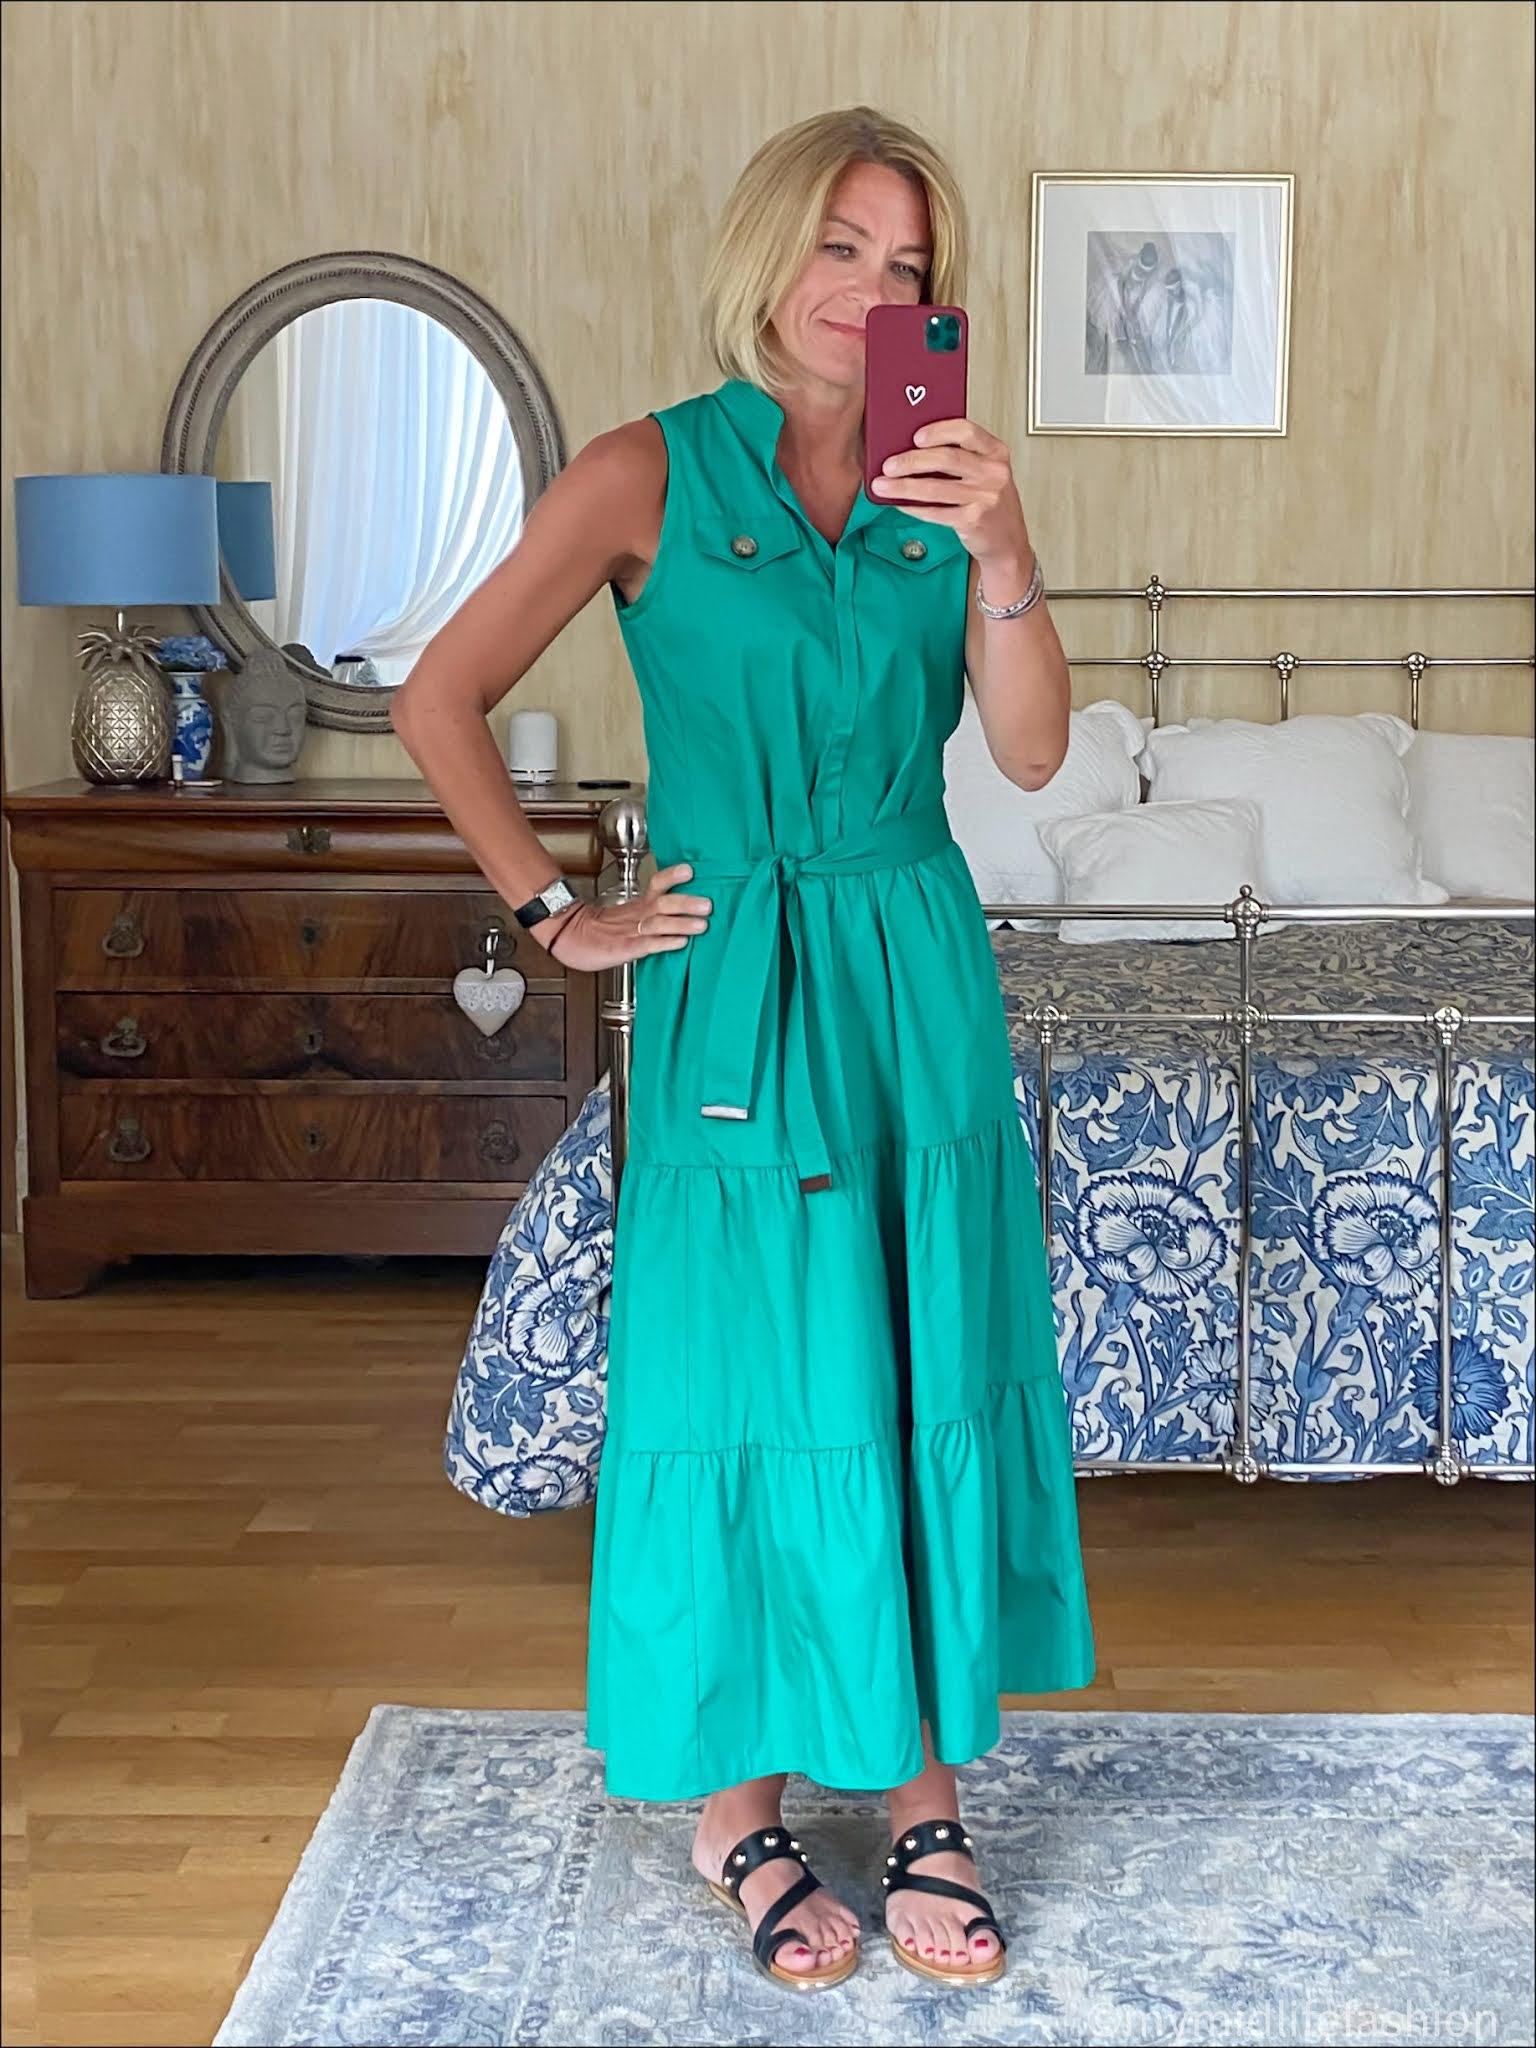 my midlife fashion, Marc cain shift dress, Carvela karafe sandals